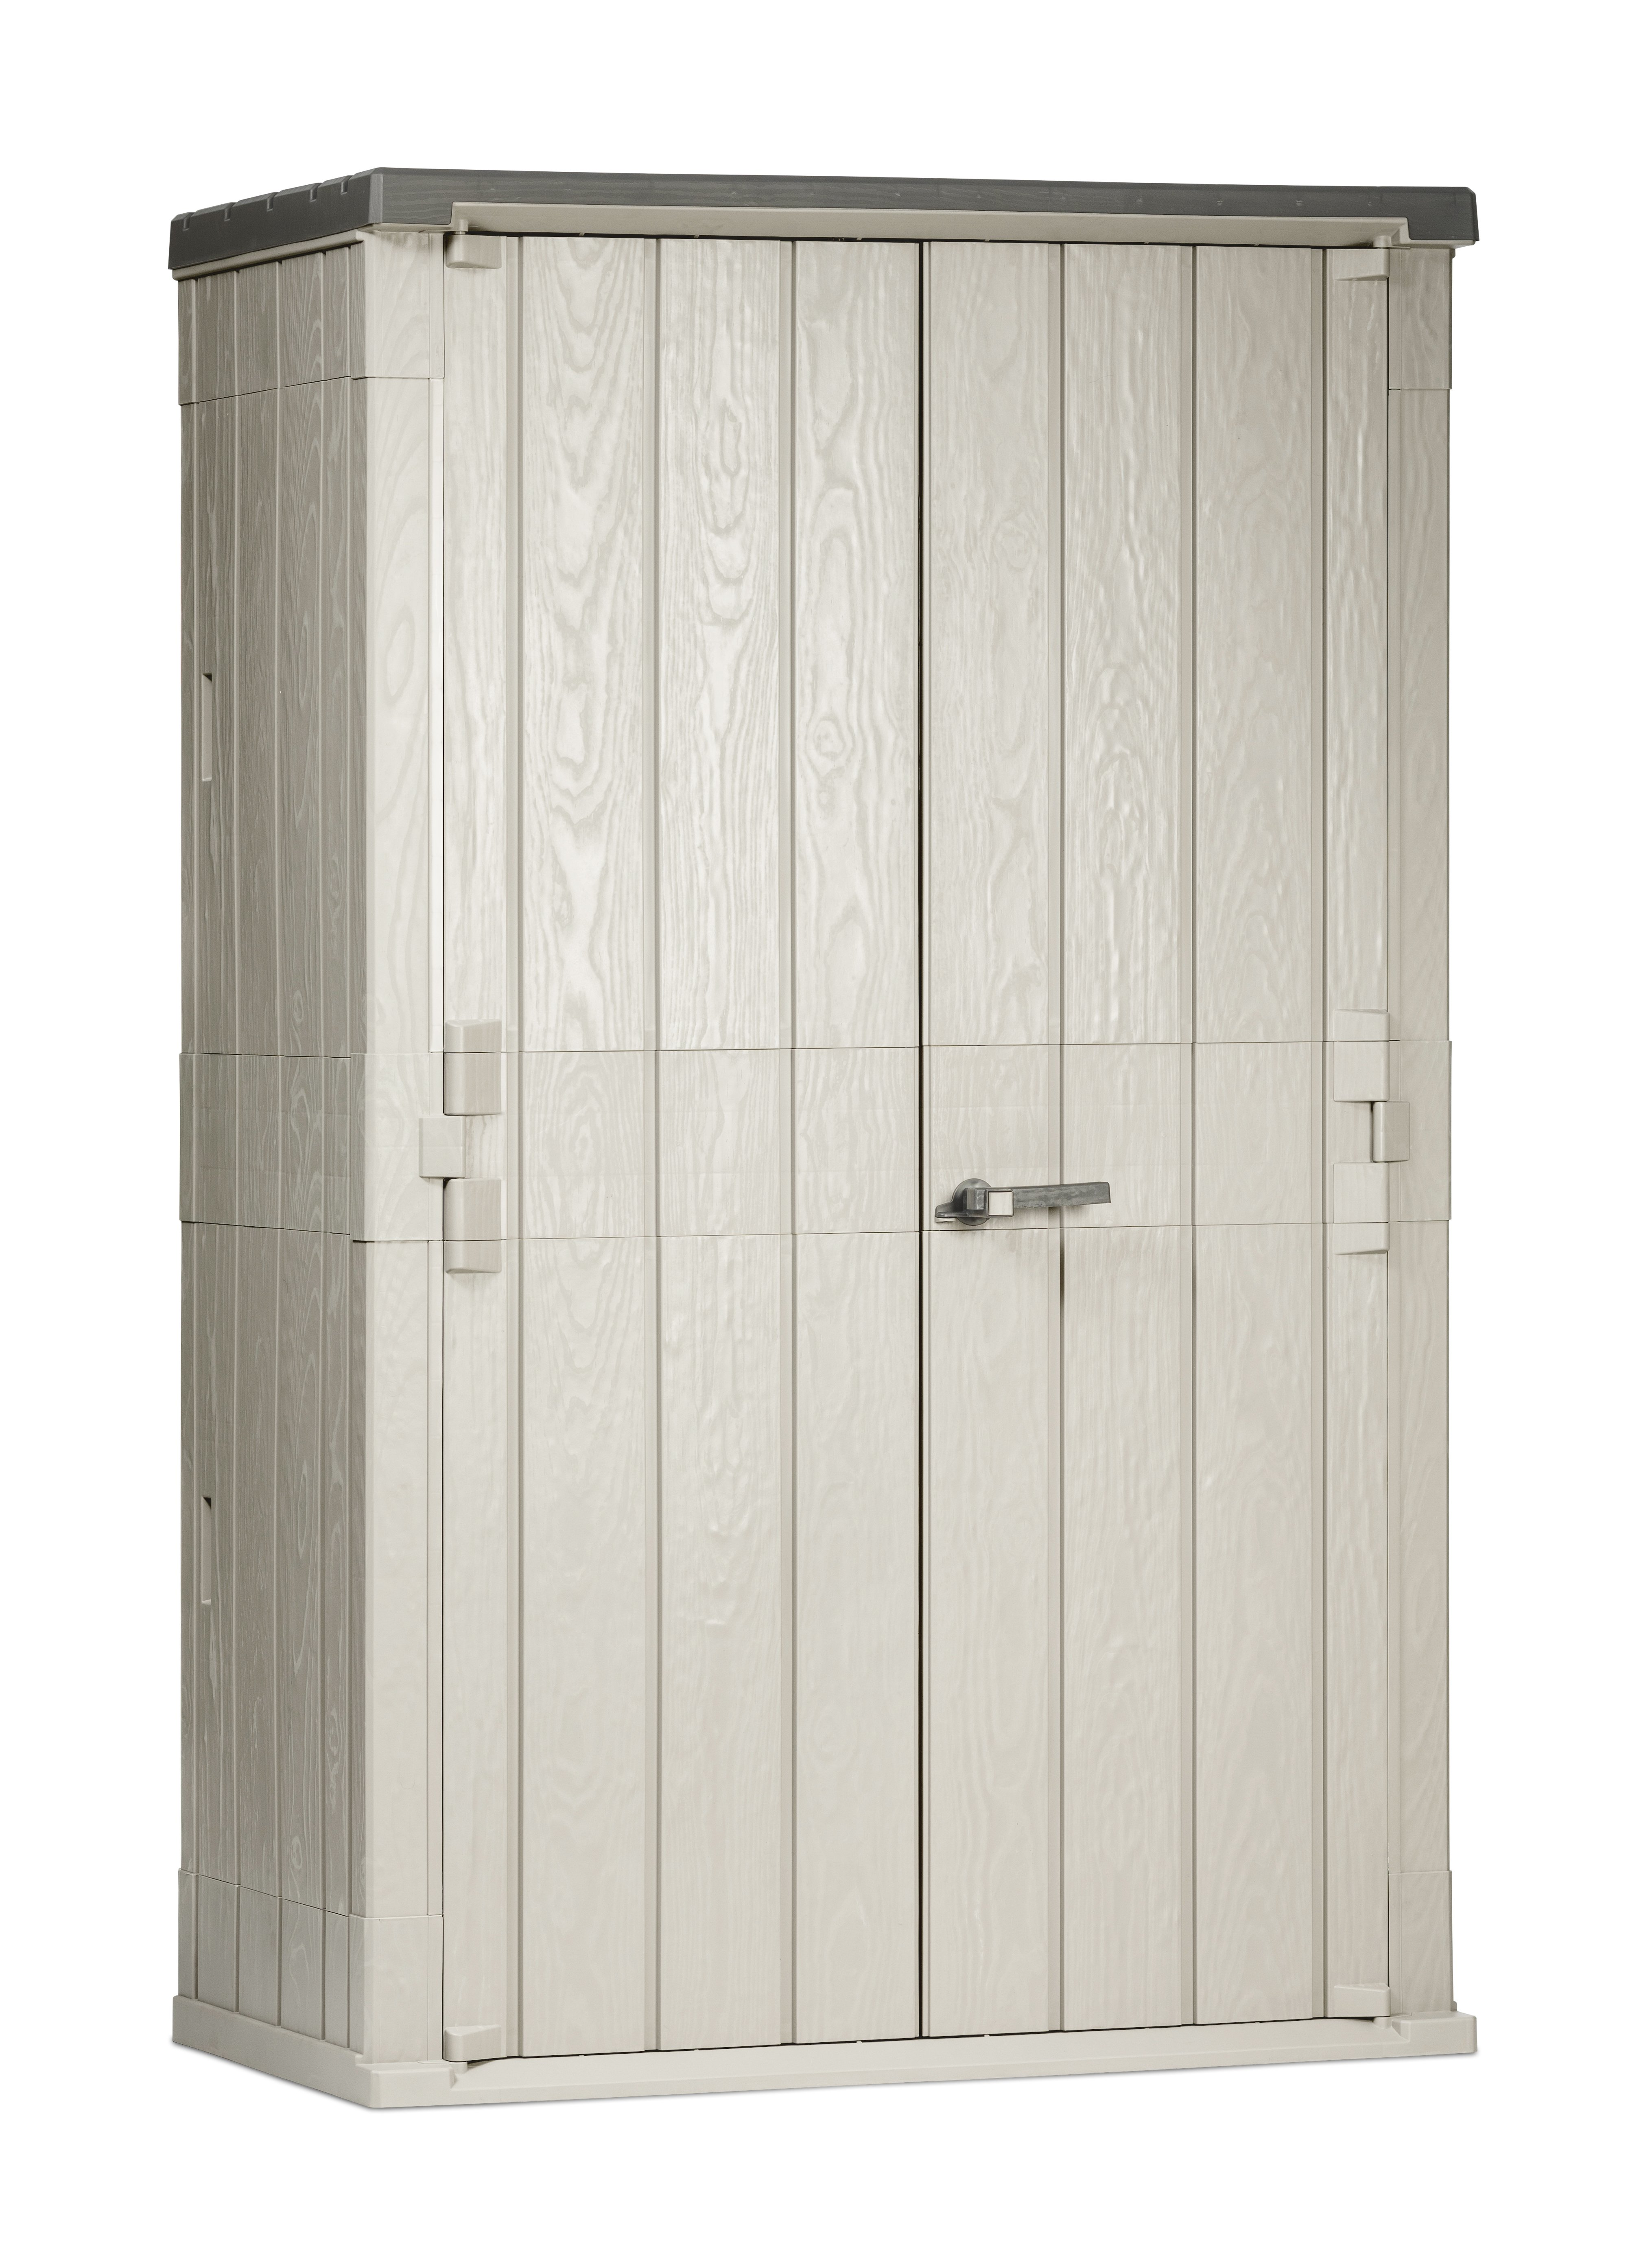 Toomax Storaway 1670L Wood Effect Garden Storage Box - Grey